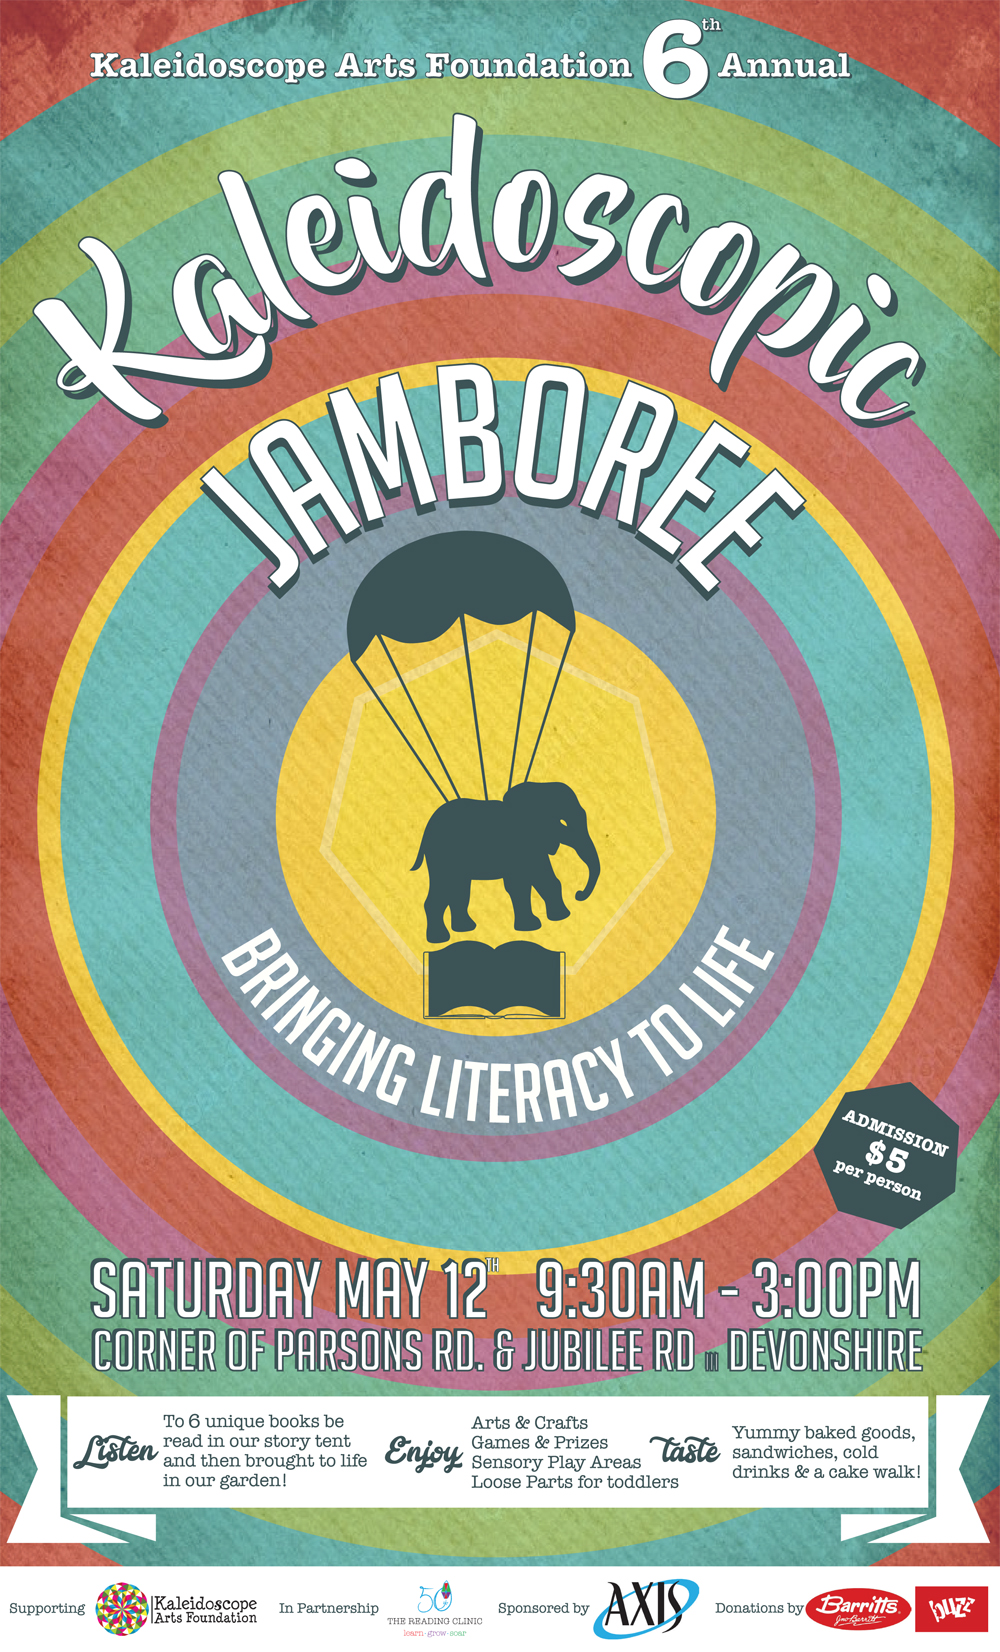 KAF Jamboree Flyer - FINAL